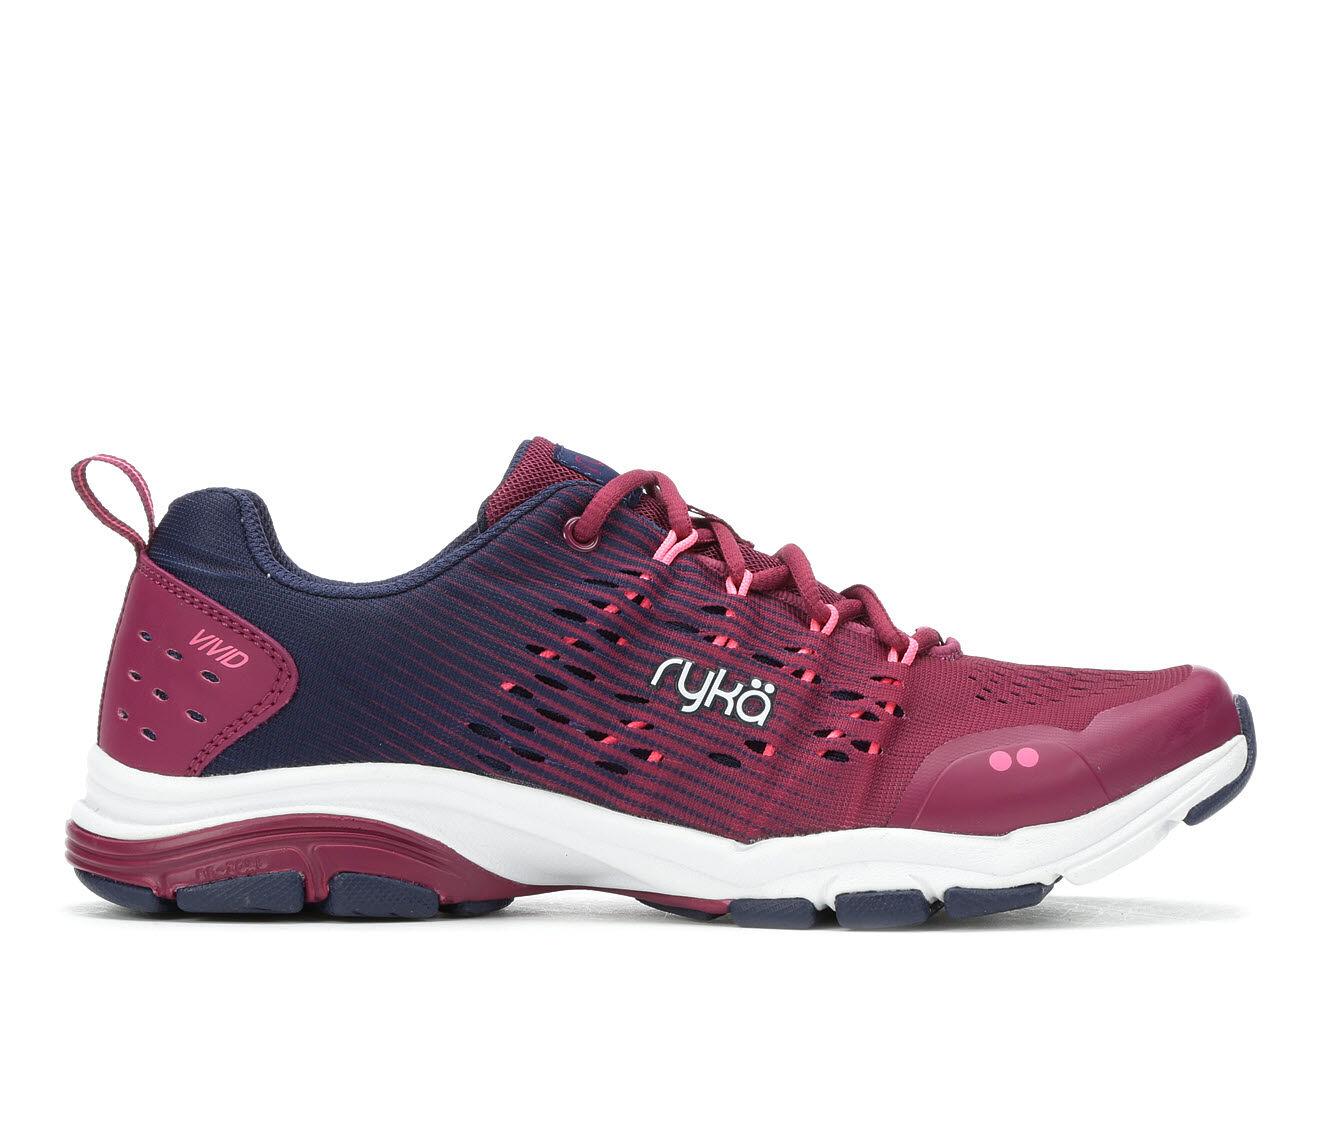 Women's Ryka Vivid RZX Training Shoes Rasp/Purple/Wht